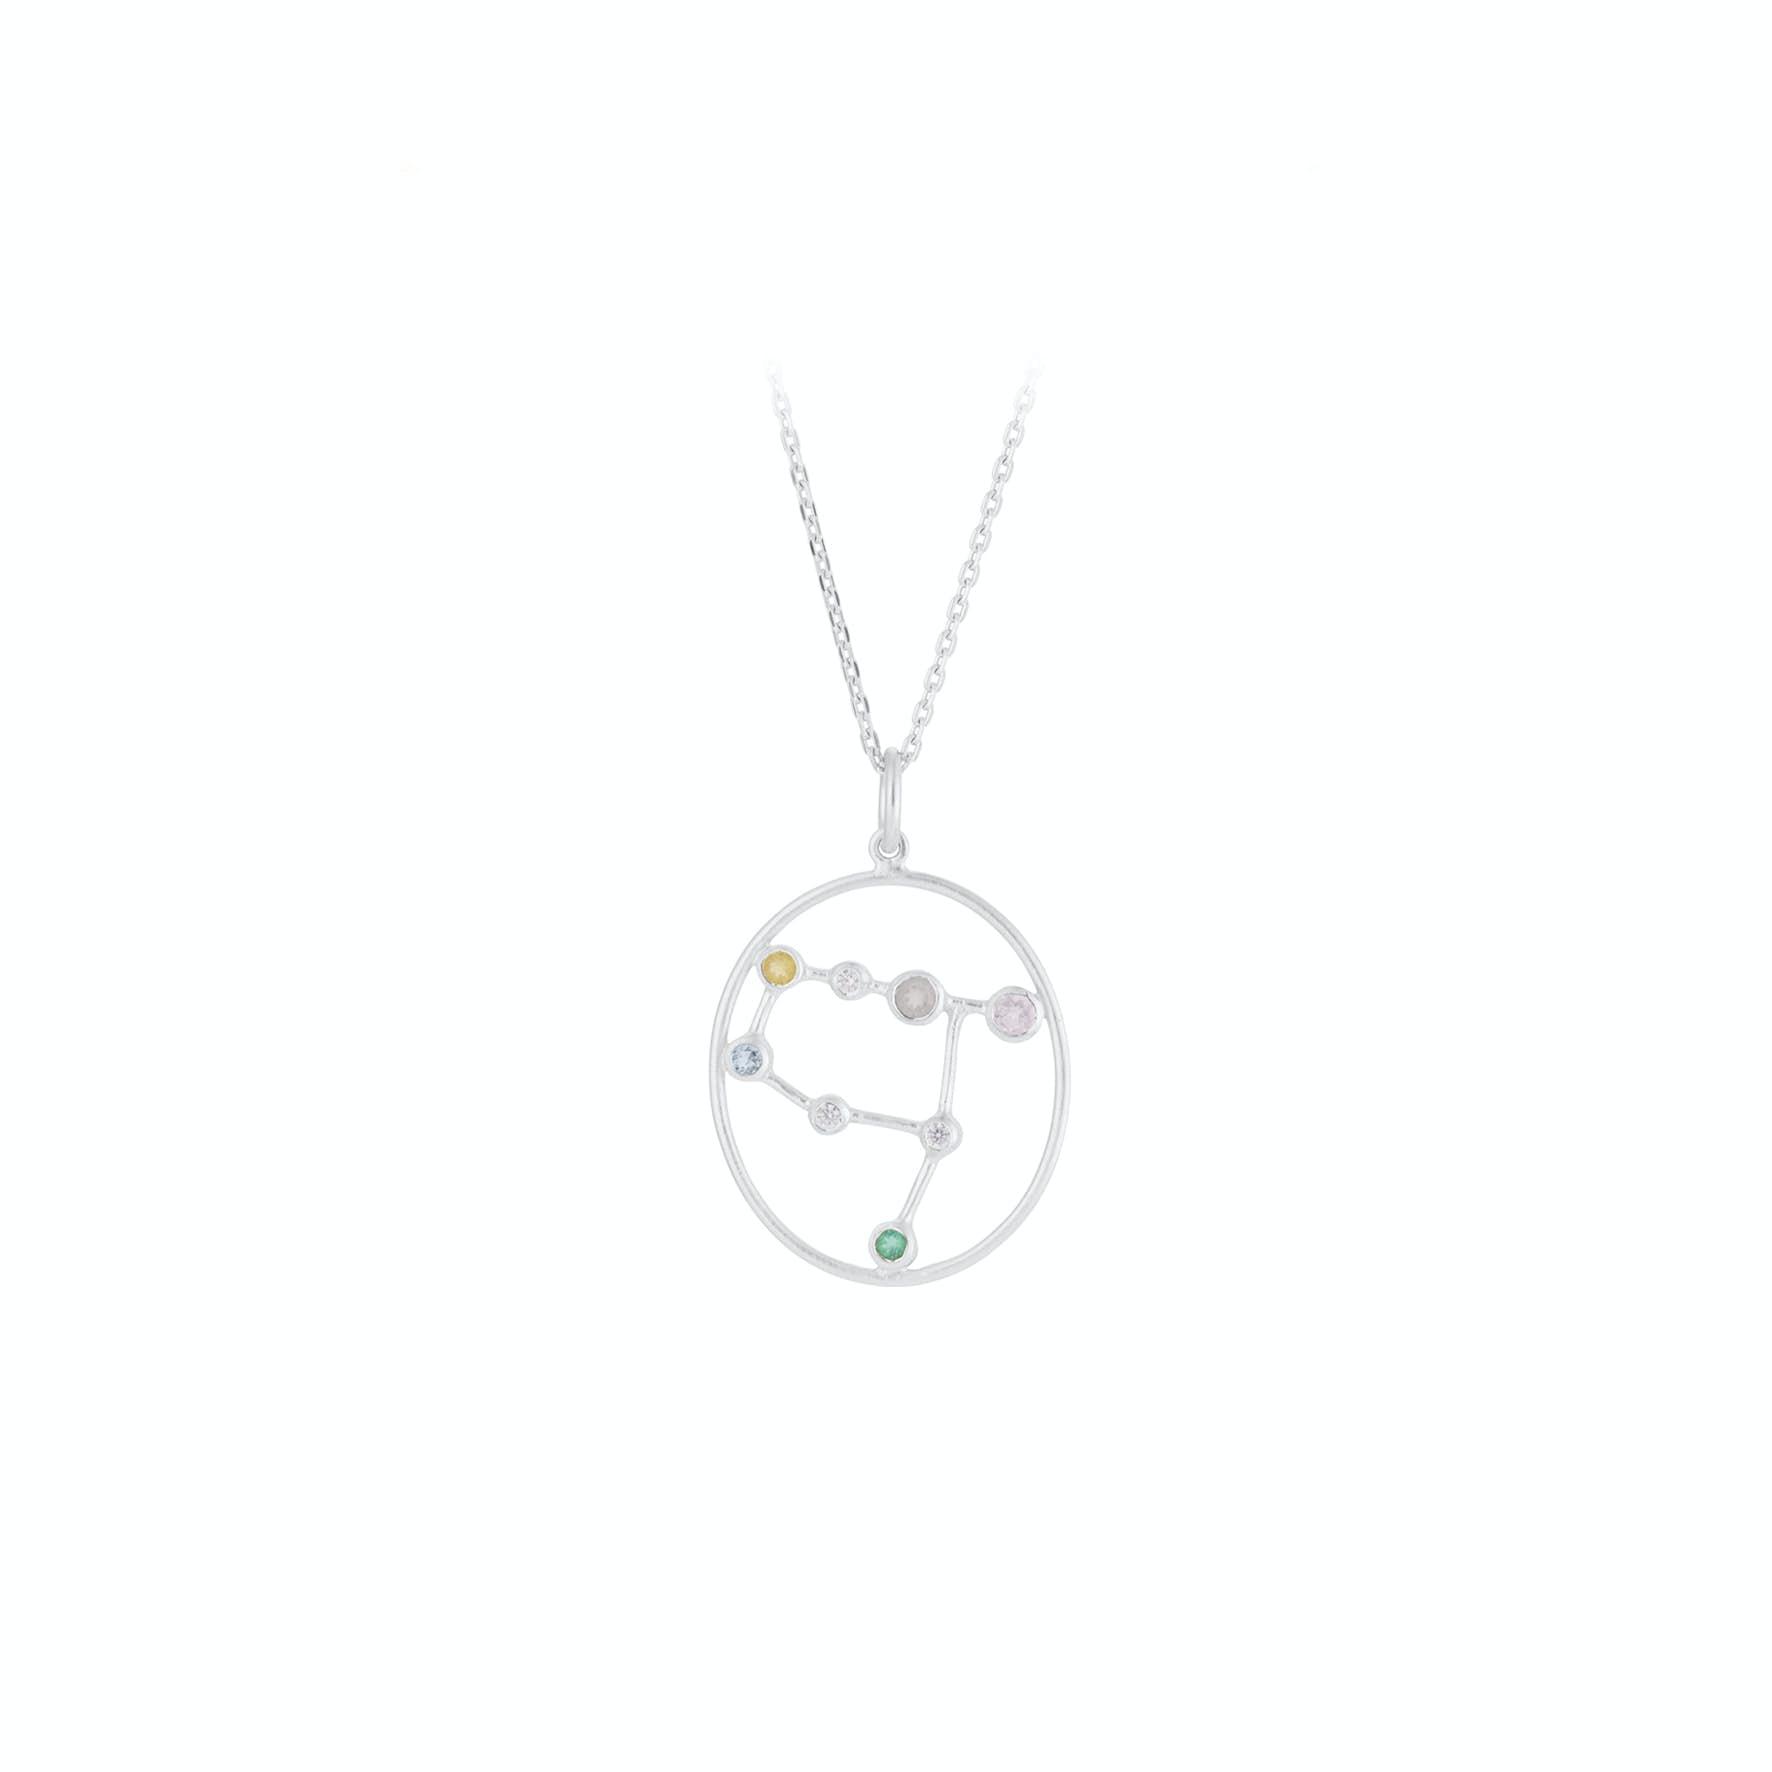 Zodiac Gemini Necklace (May 22 - June 21) von Pernille Corydon in Silber Sterling 925